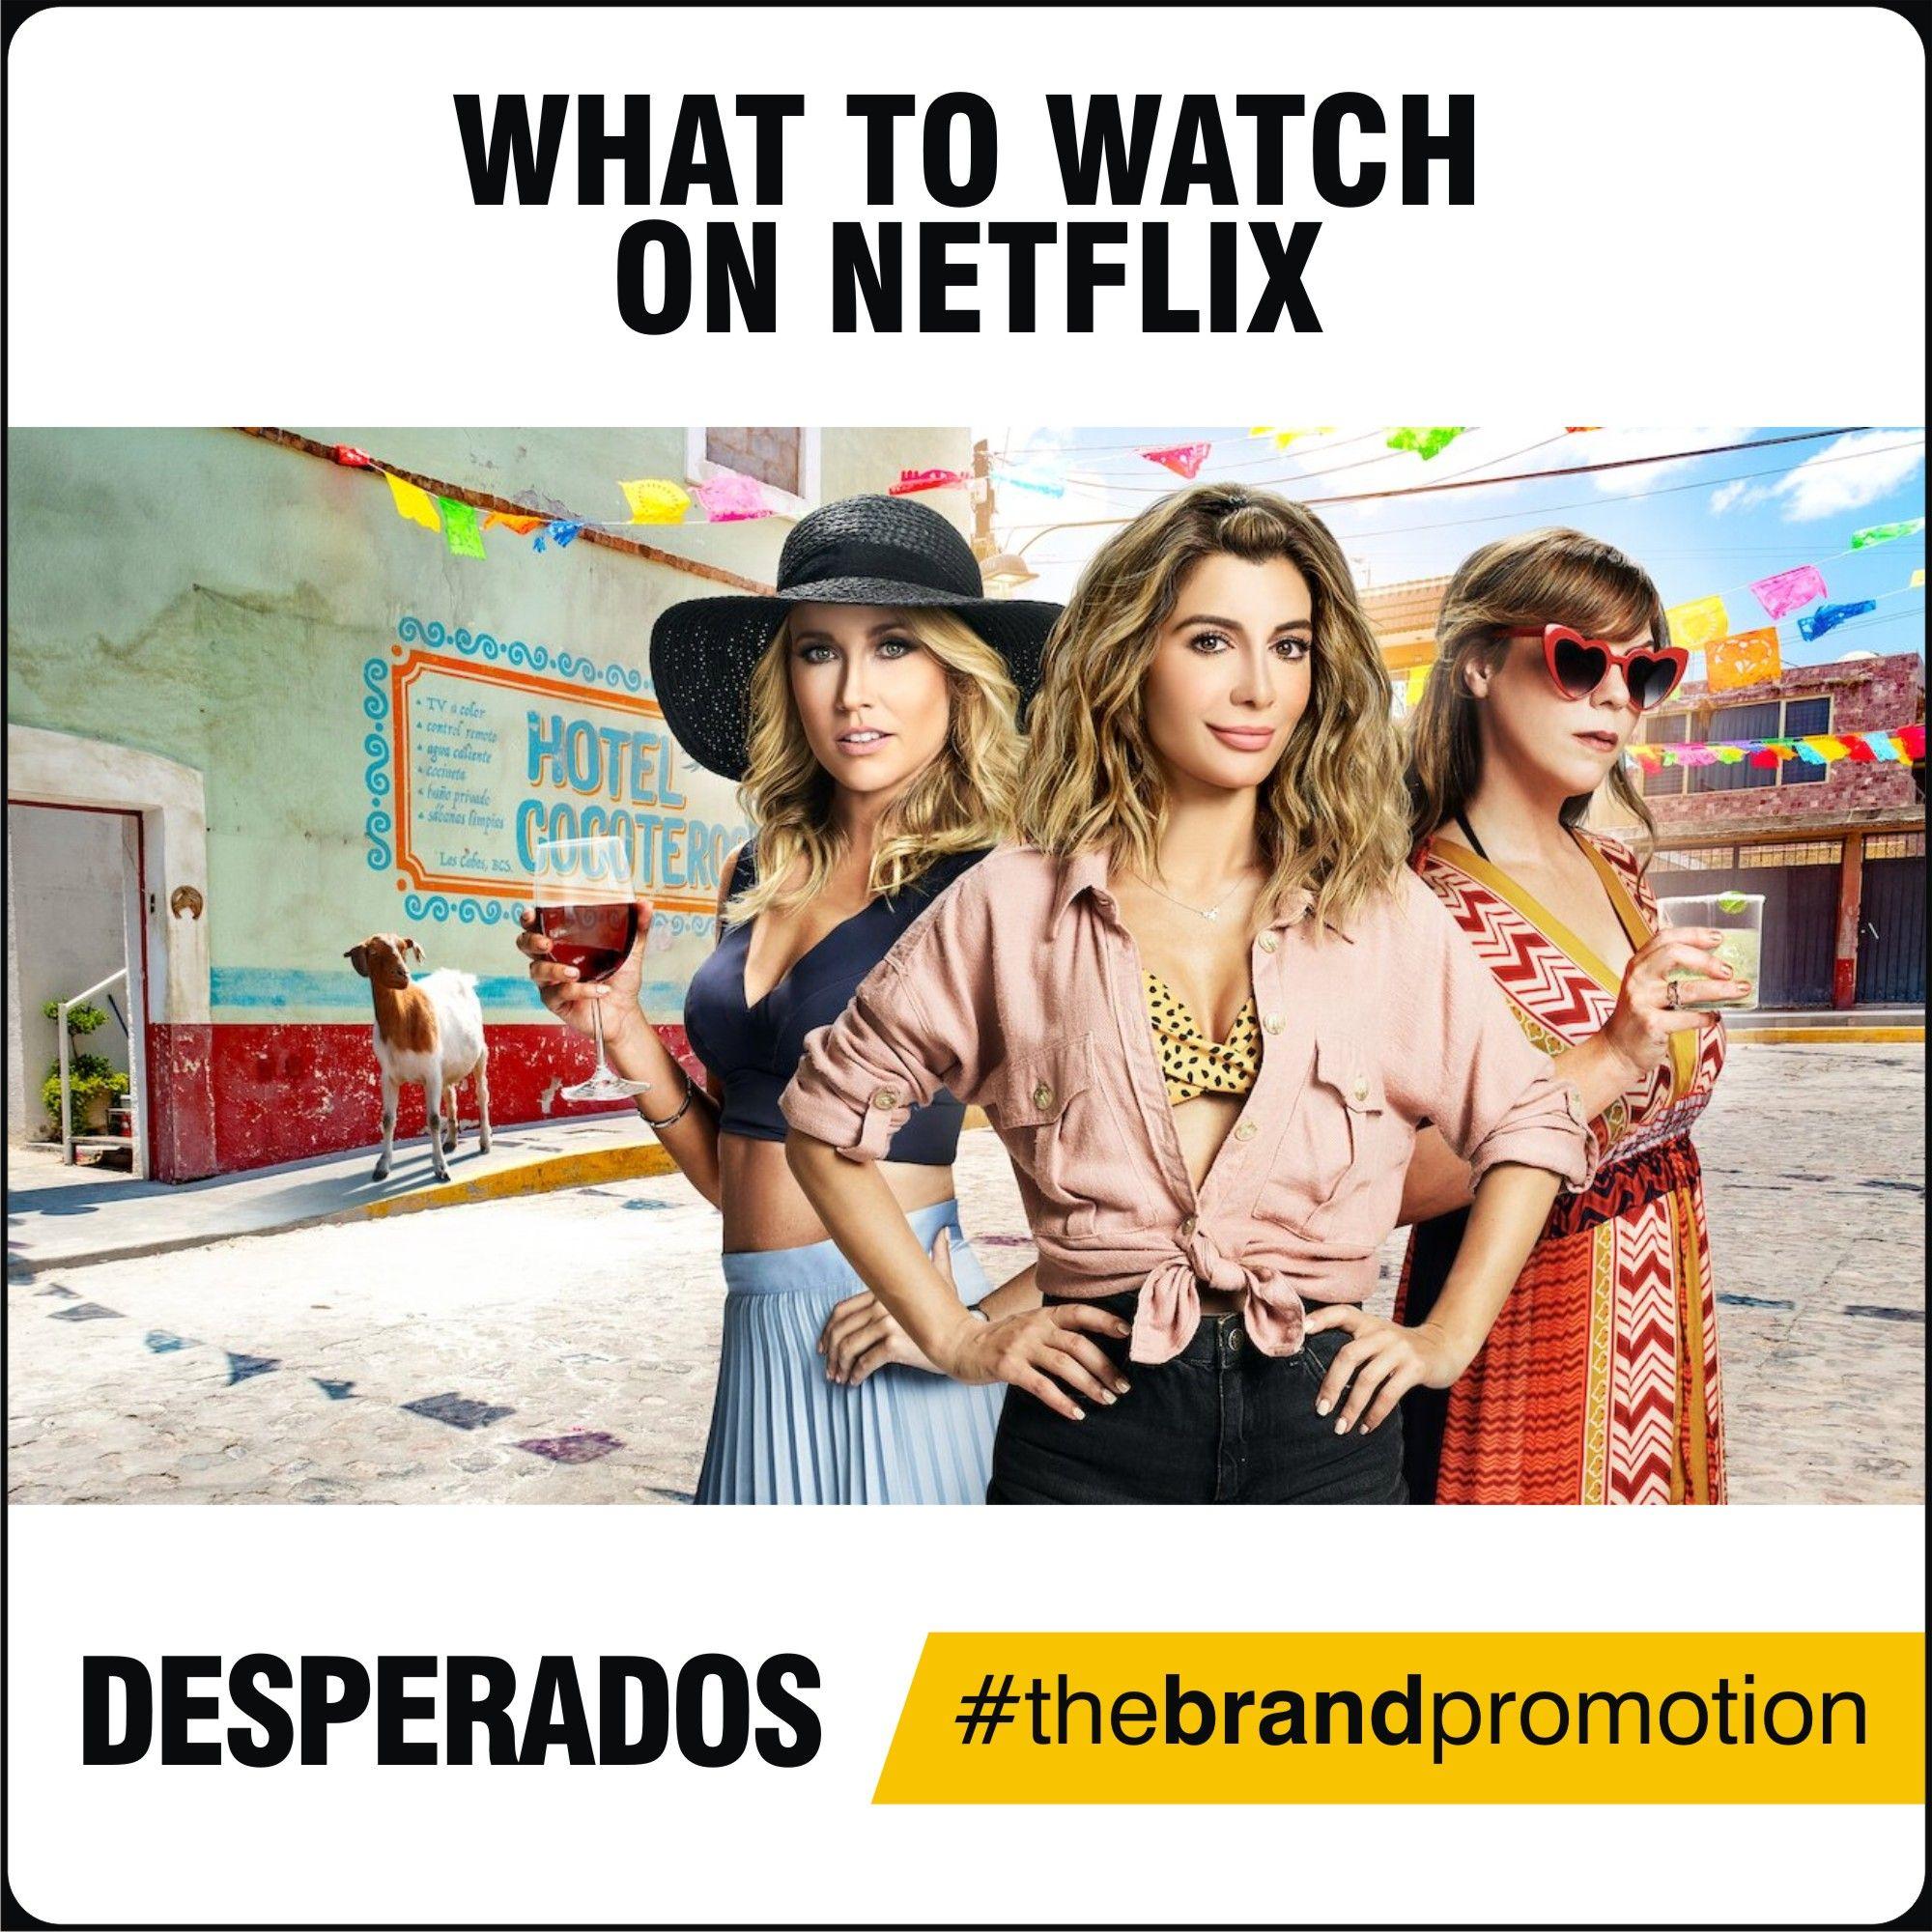 Desperados In 2020 Netflix Original Movies Great Friends Original Movie